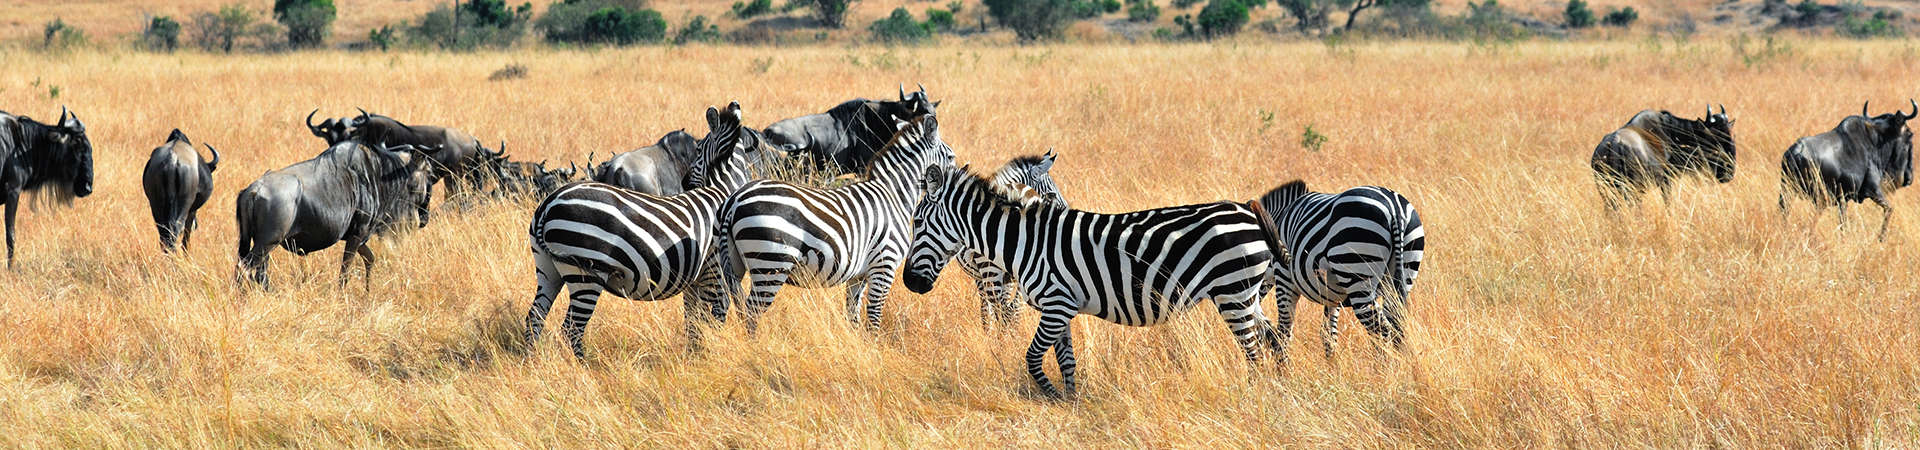 South Africa Zebras Buffalos